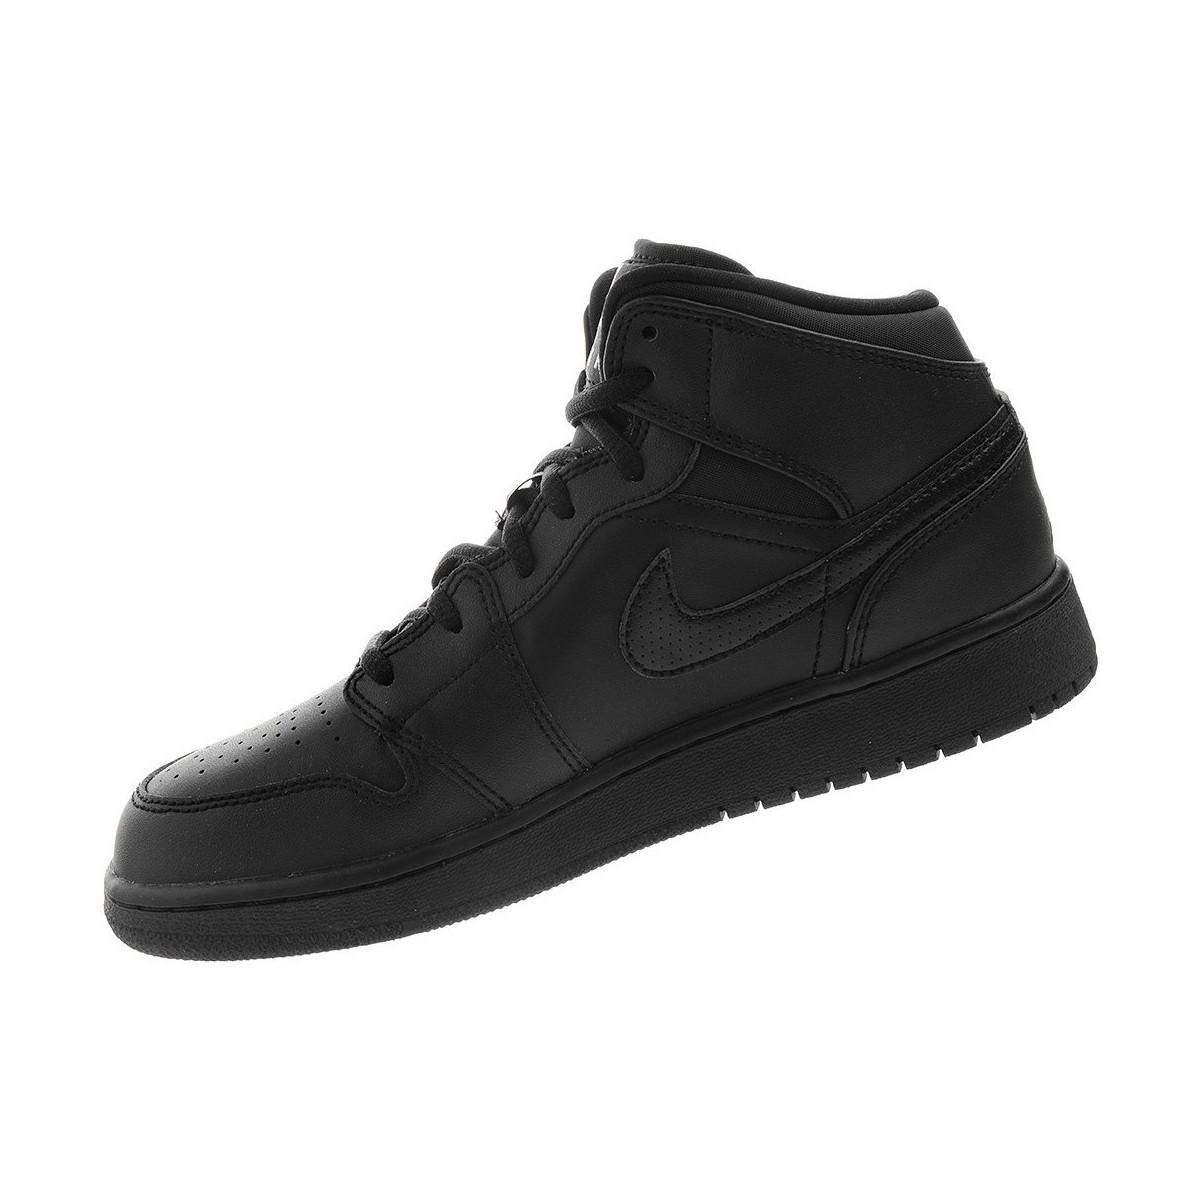 pretty nice 1c345 6084b Nike Air Jordan 1 Mid Bg Women's Shoes (high-top Trainers ...